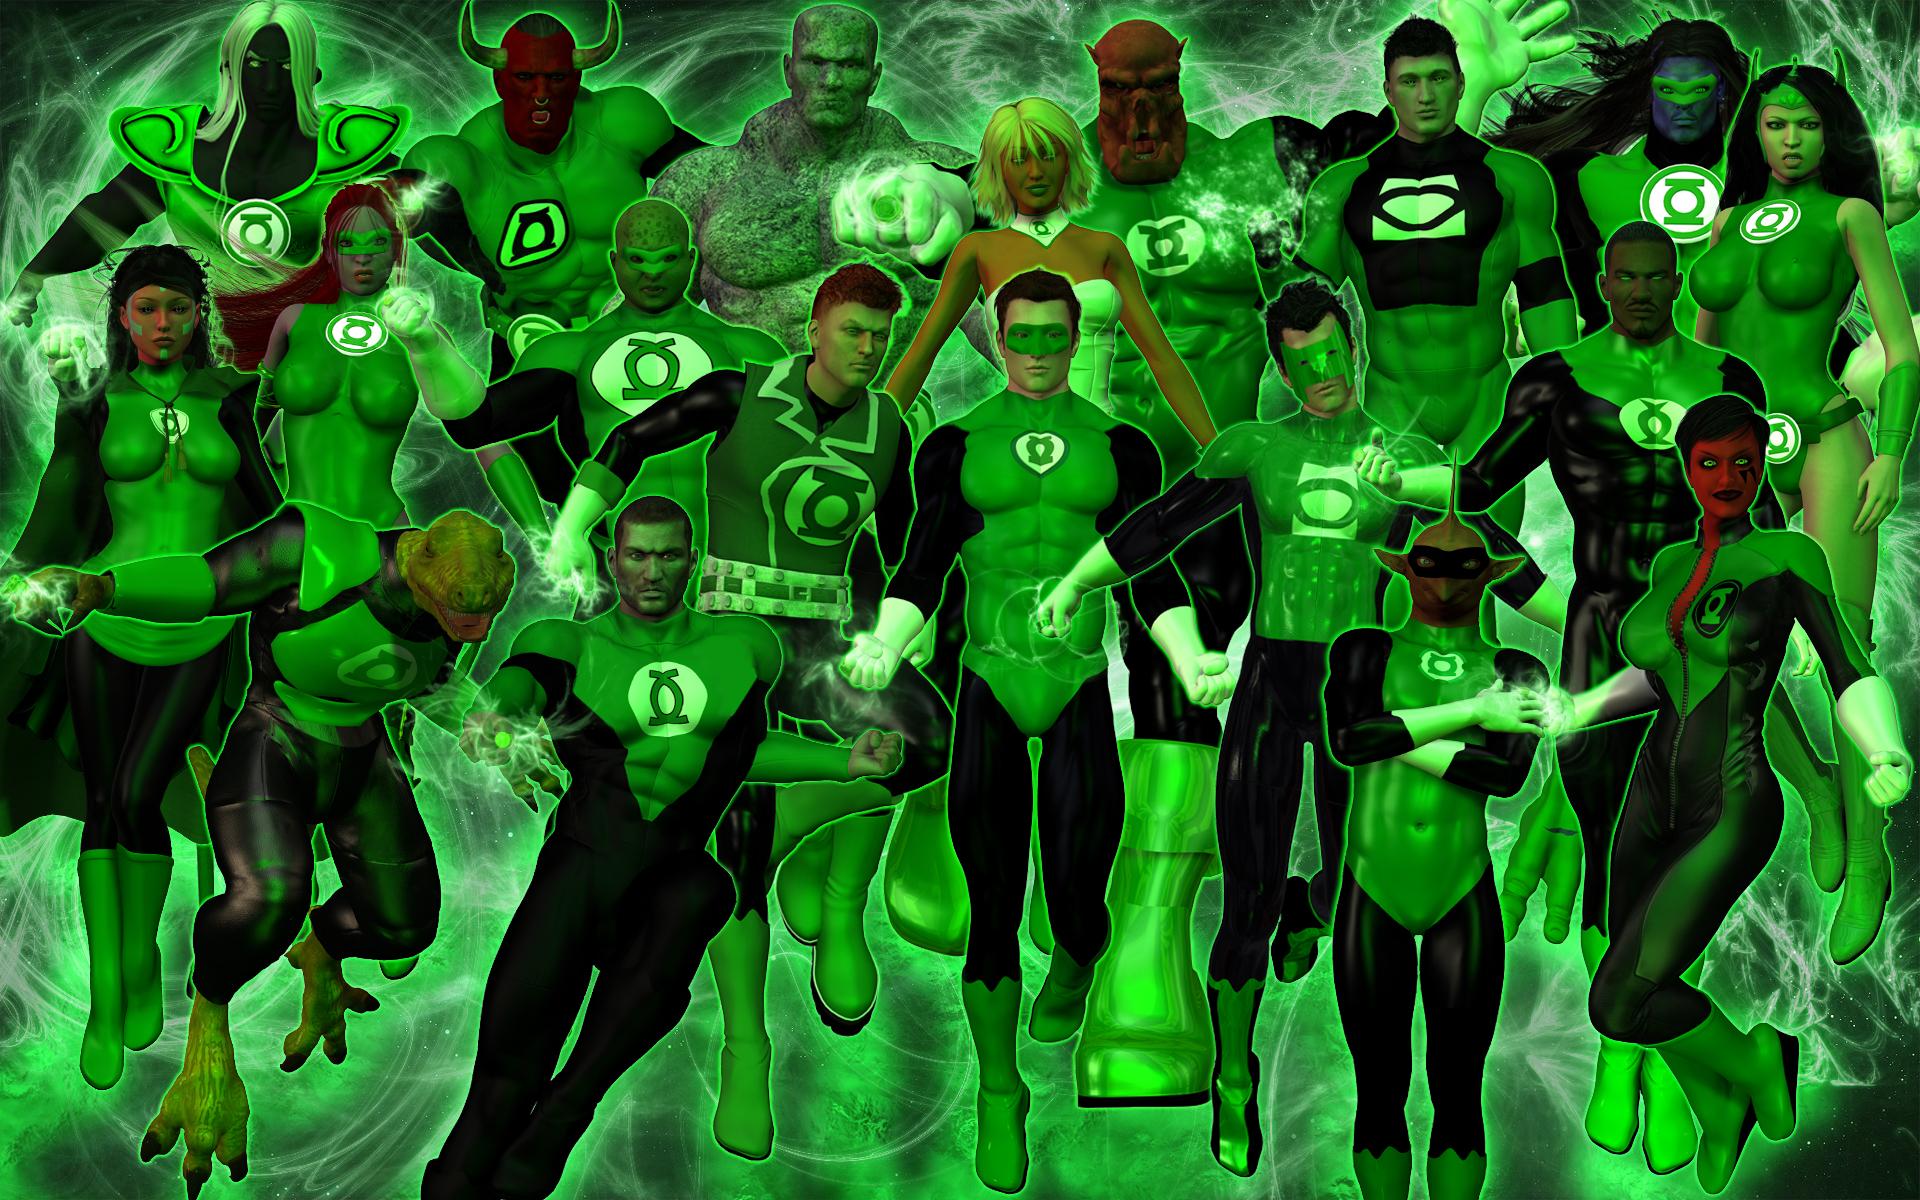 green lantern oath wallpaper - photo #28